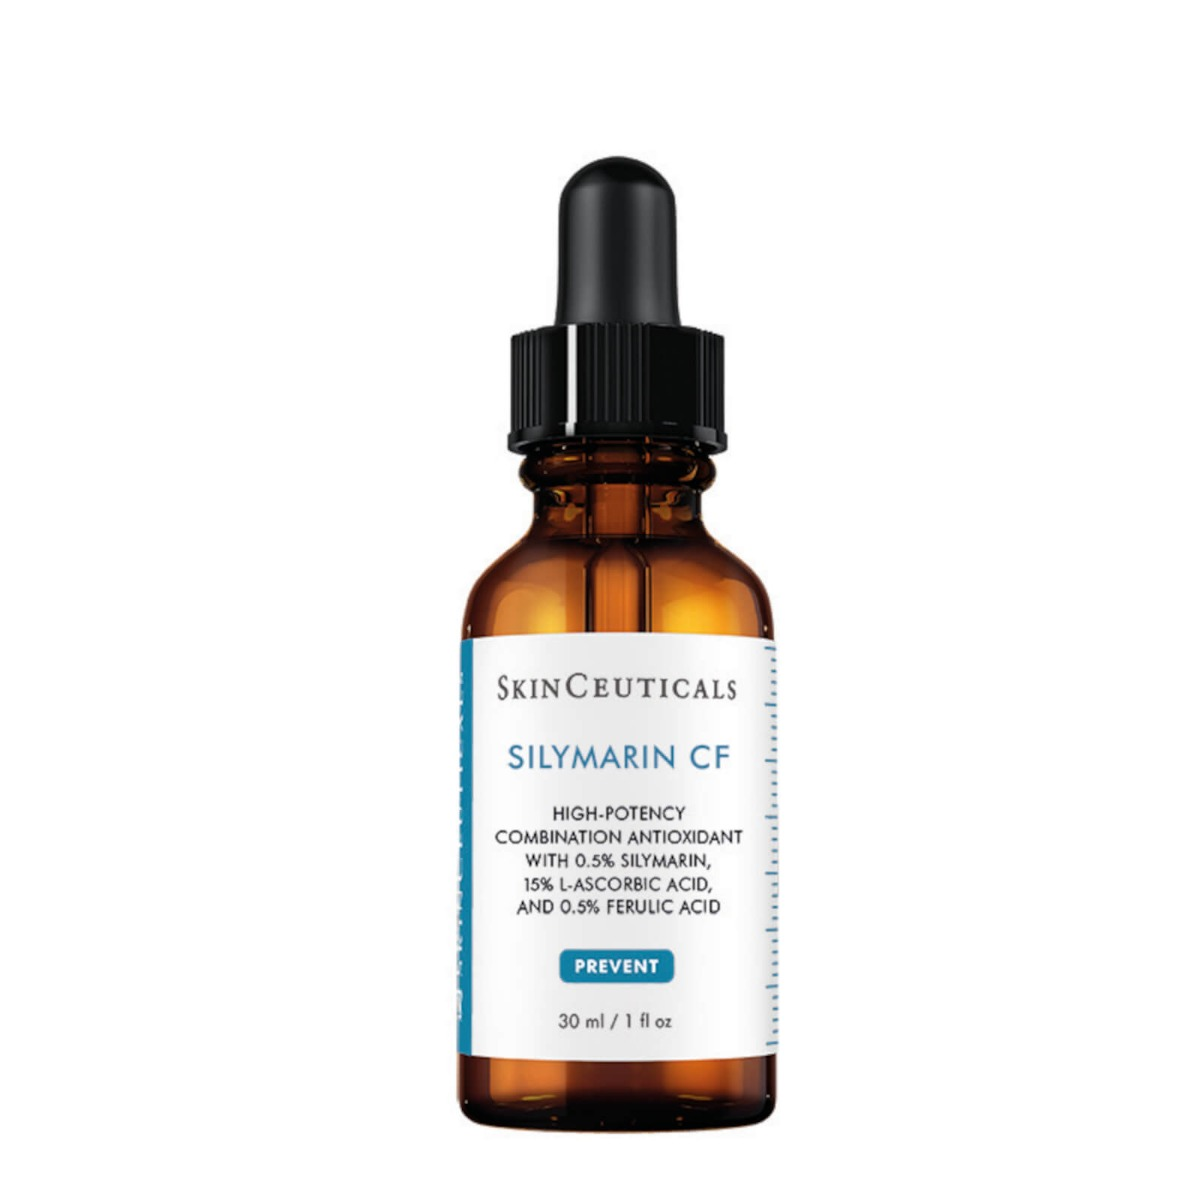 Skincare SkinCeuticals Silymarin CF 30ml